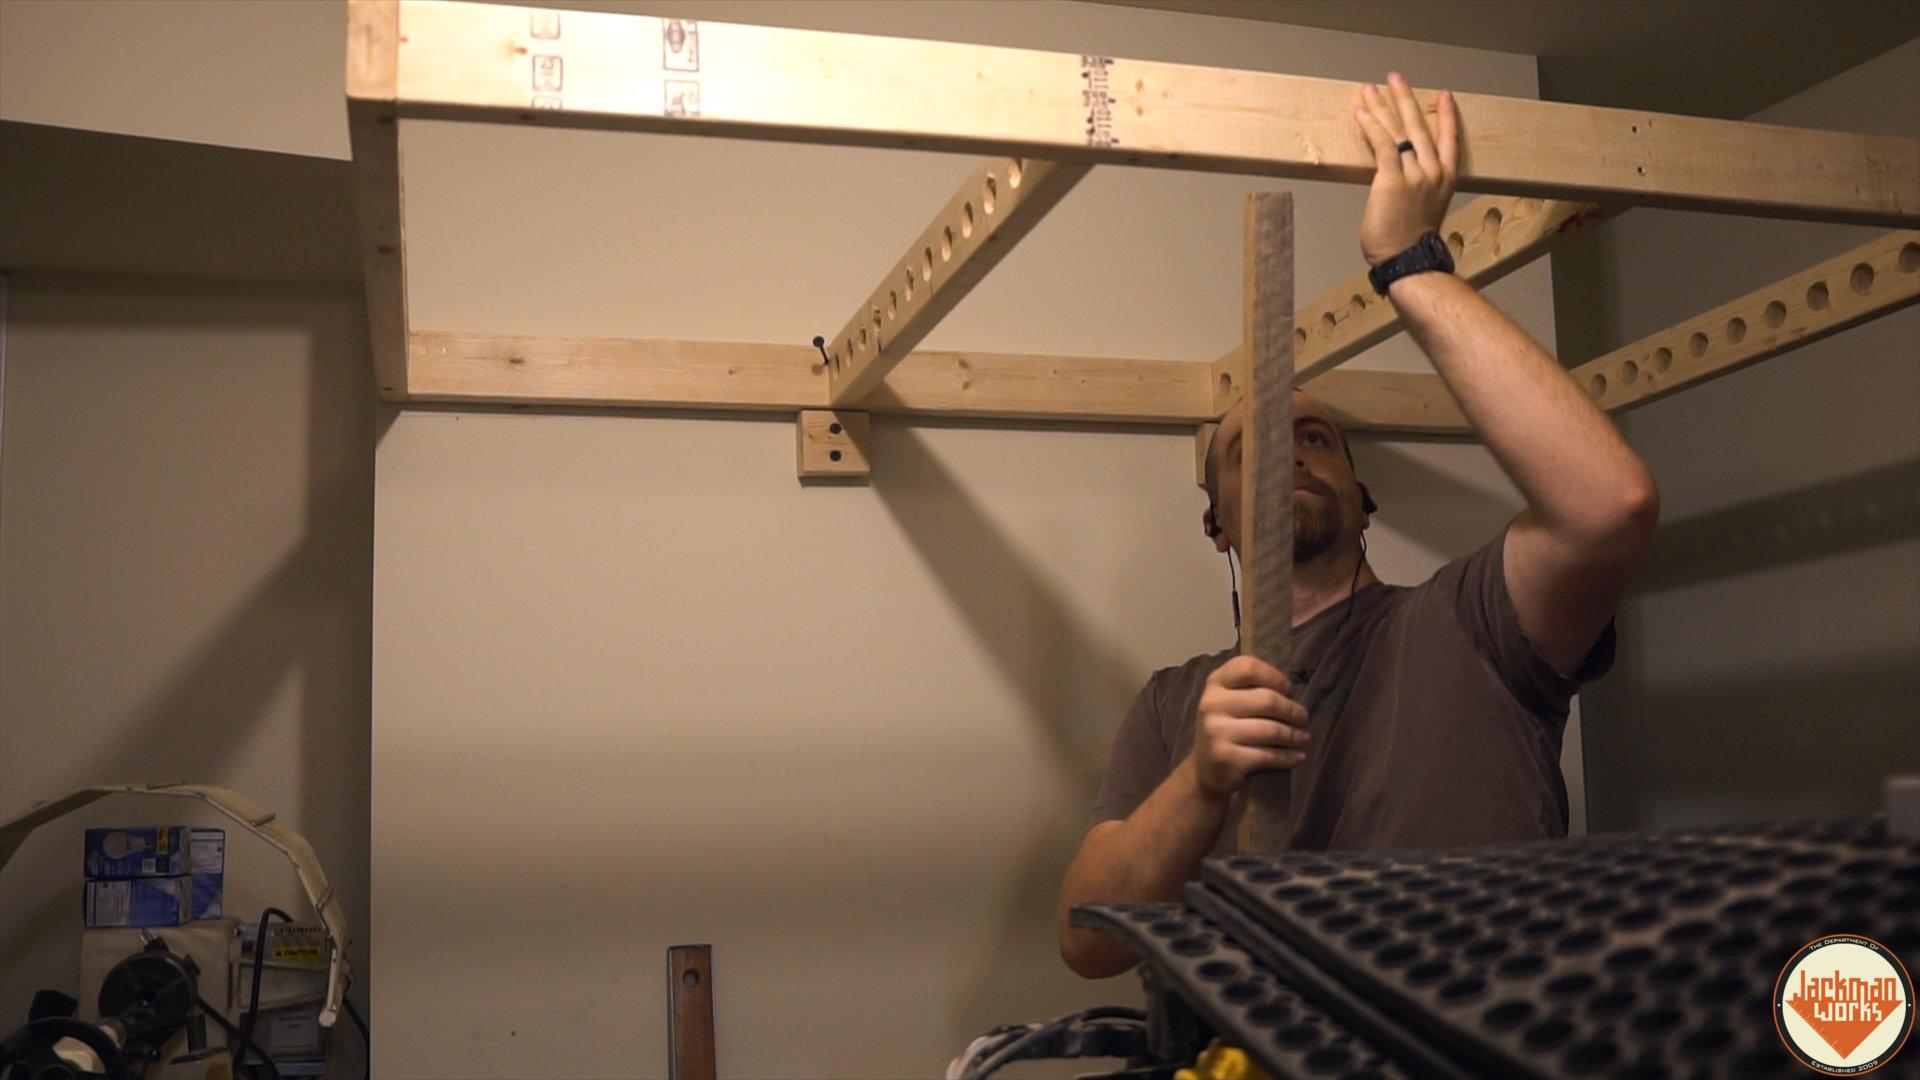 Floating Garage Storage Loft And Clamp Rack 14 Jackman Works